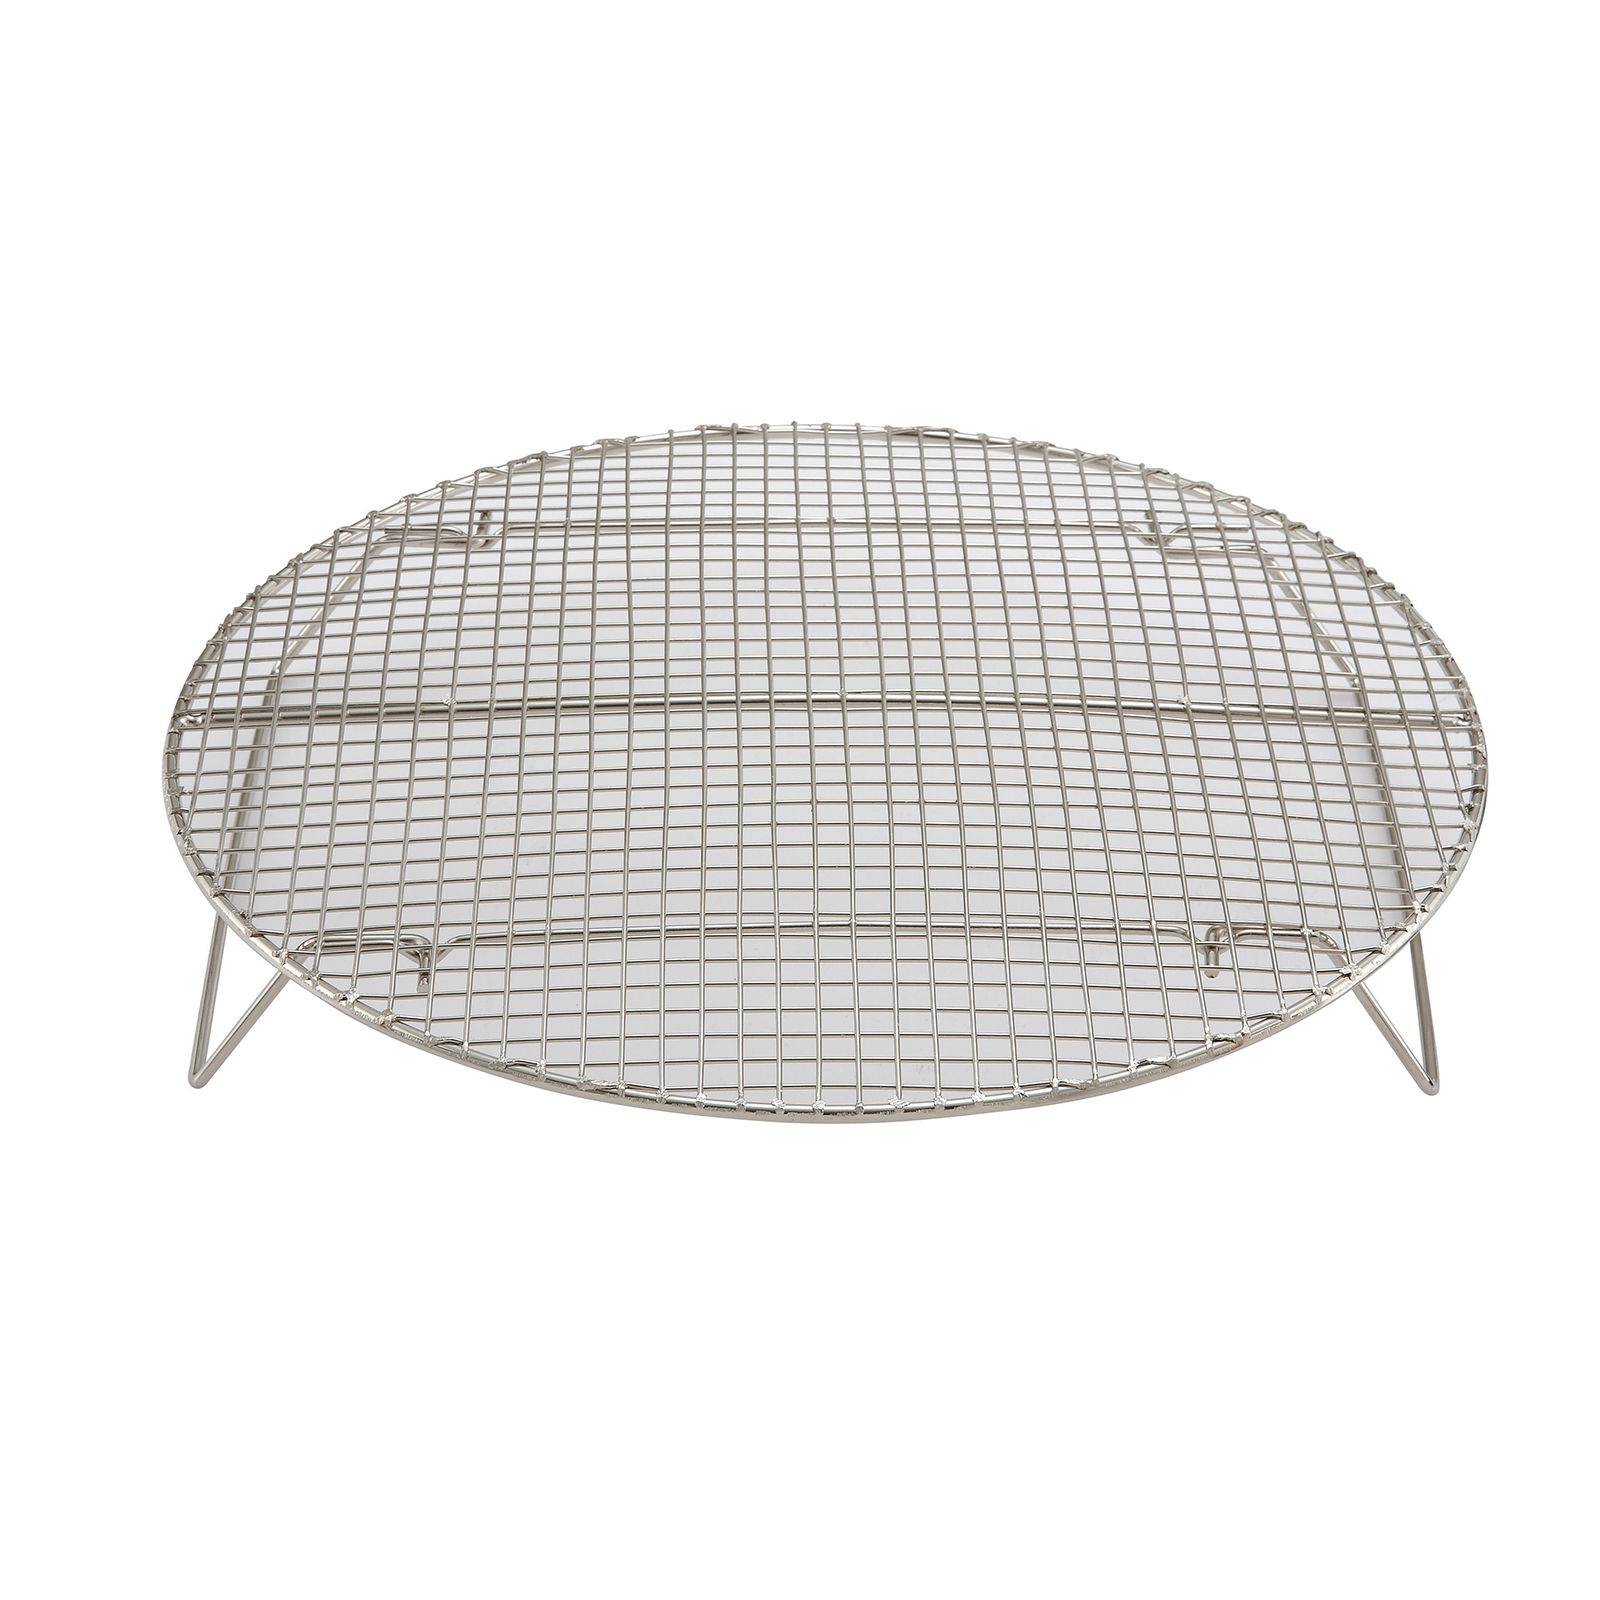 Winco STR-10 wire pan rack / grate